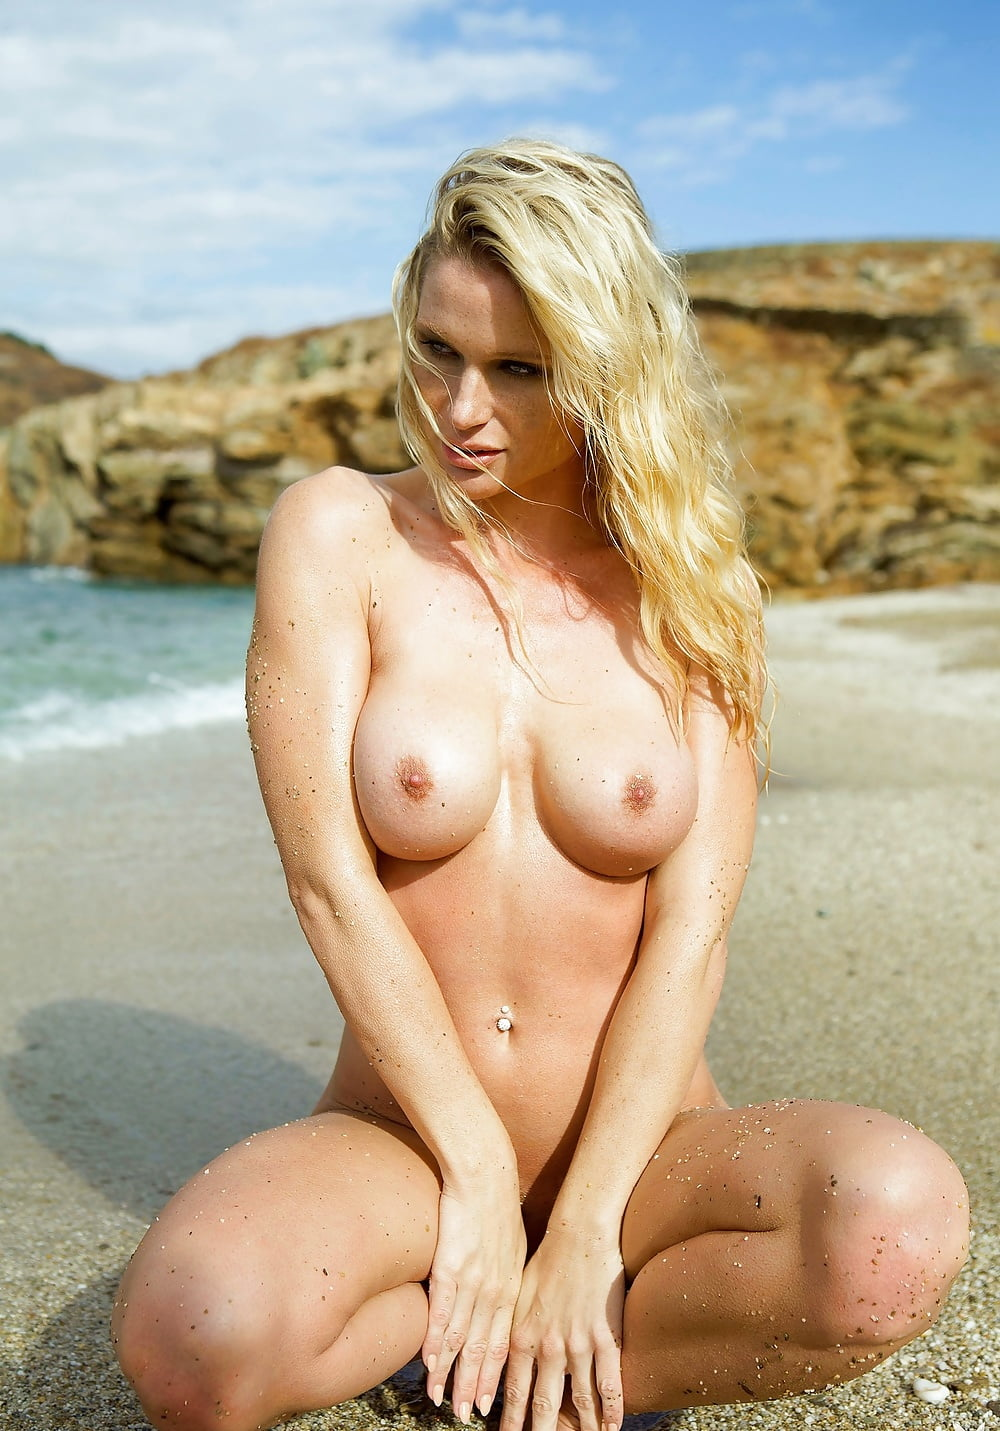 Ramona bernhard nude